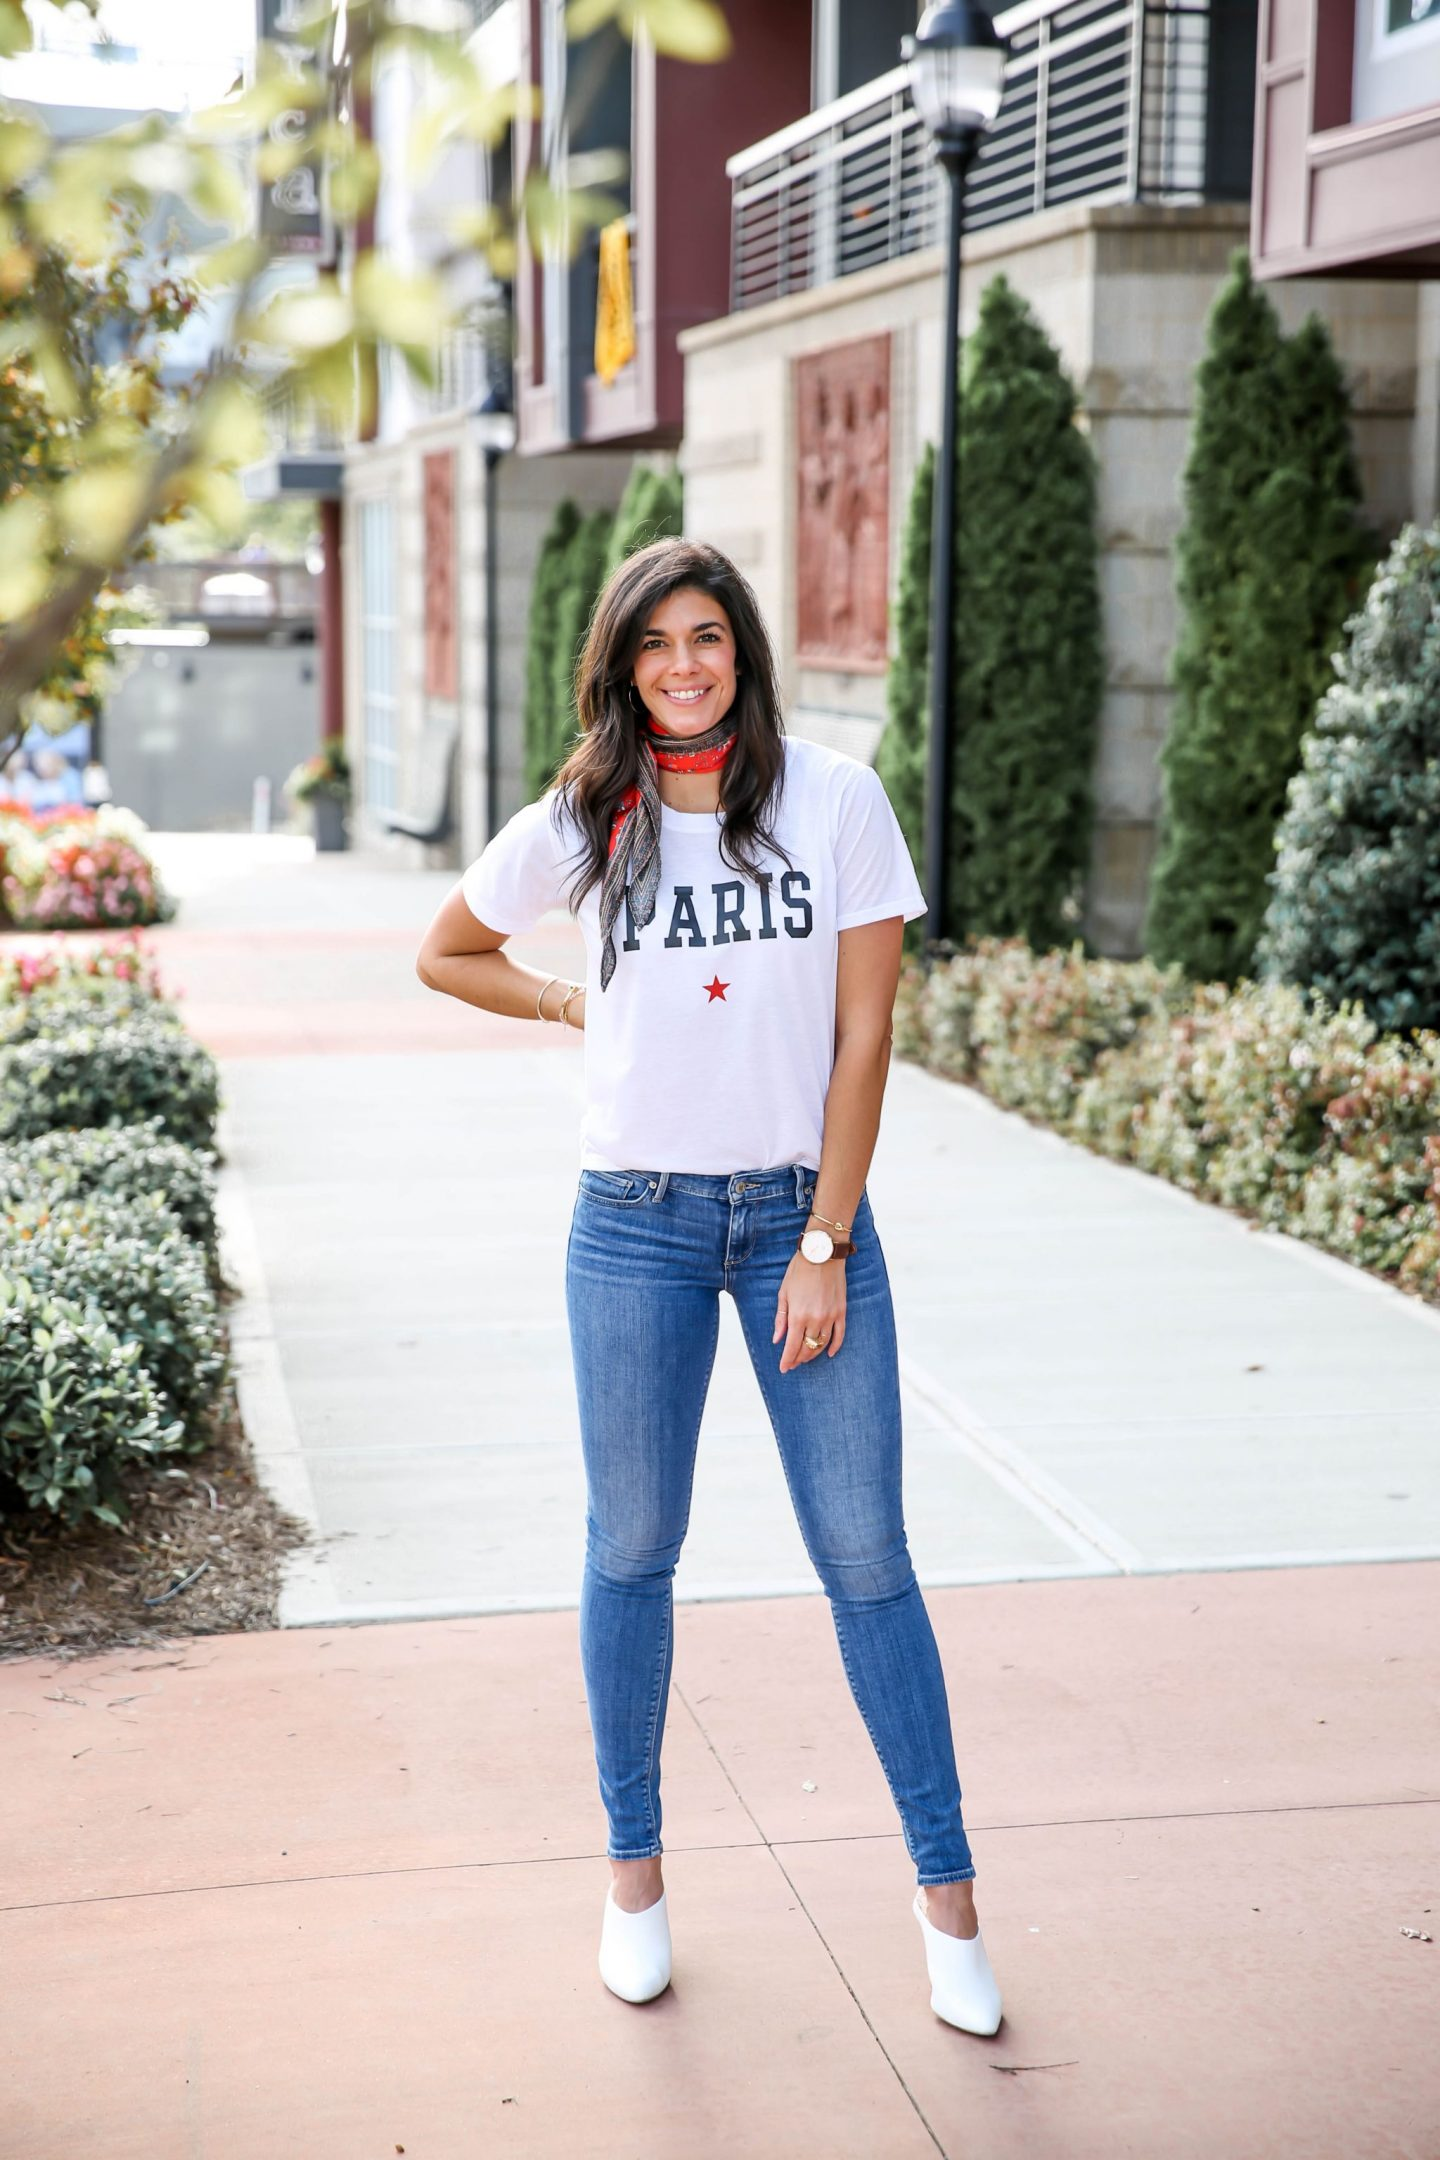 Paris graphic tee - skinny jeans - casual chic style - Lauren Schwaiger